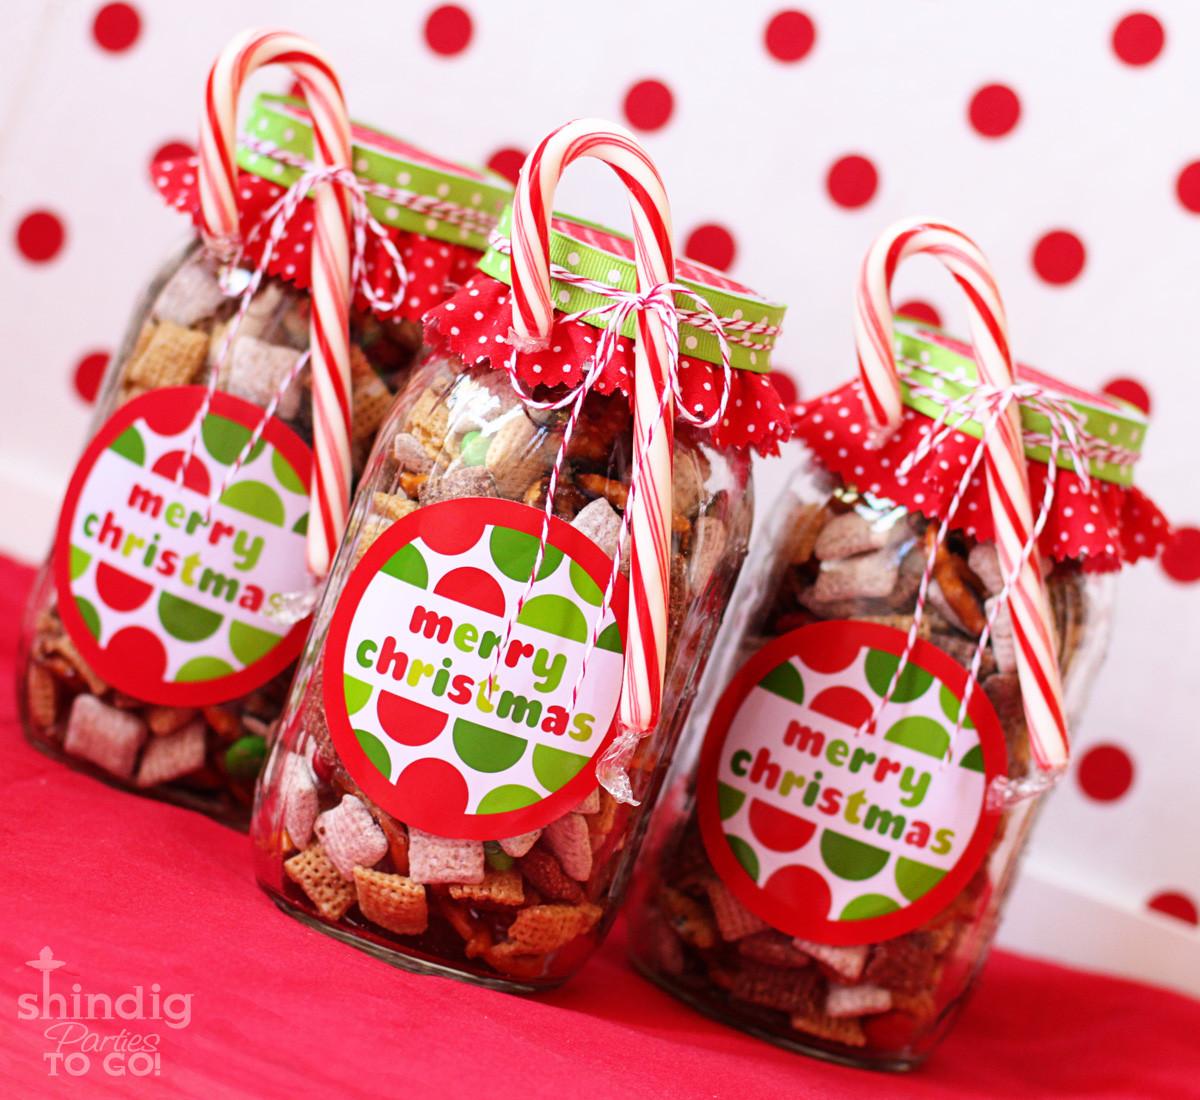 DIY Easy Christmas Gifts  How To Make Handmade Chex Mix Holiday Gifts & Bonus Free